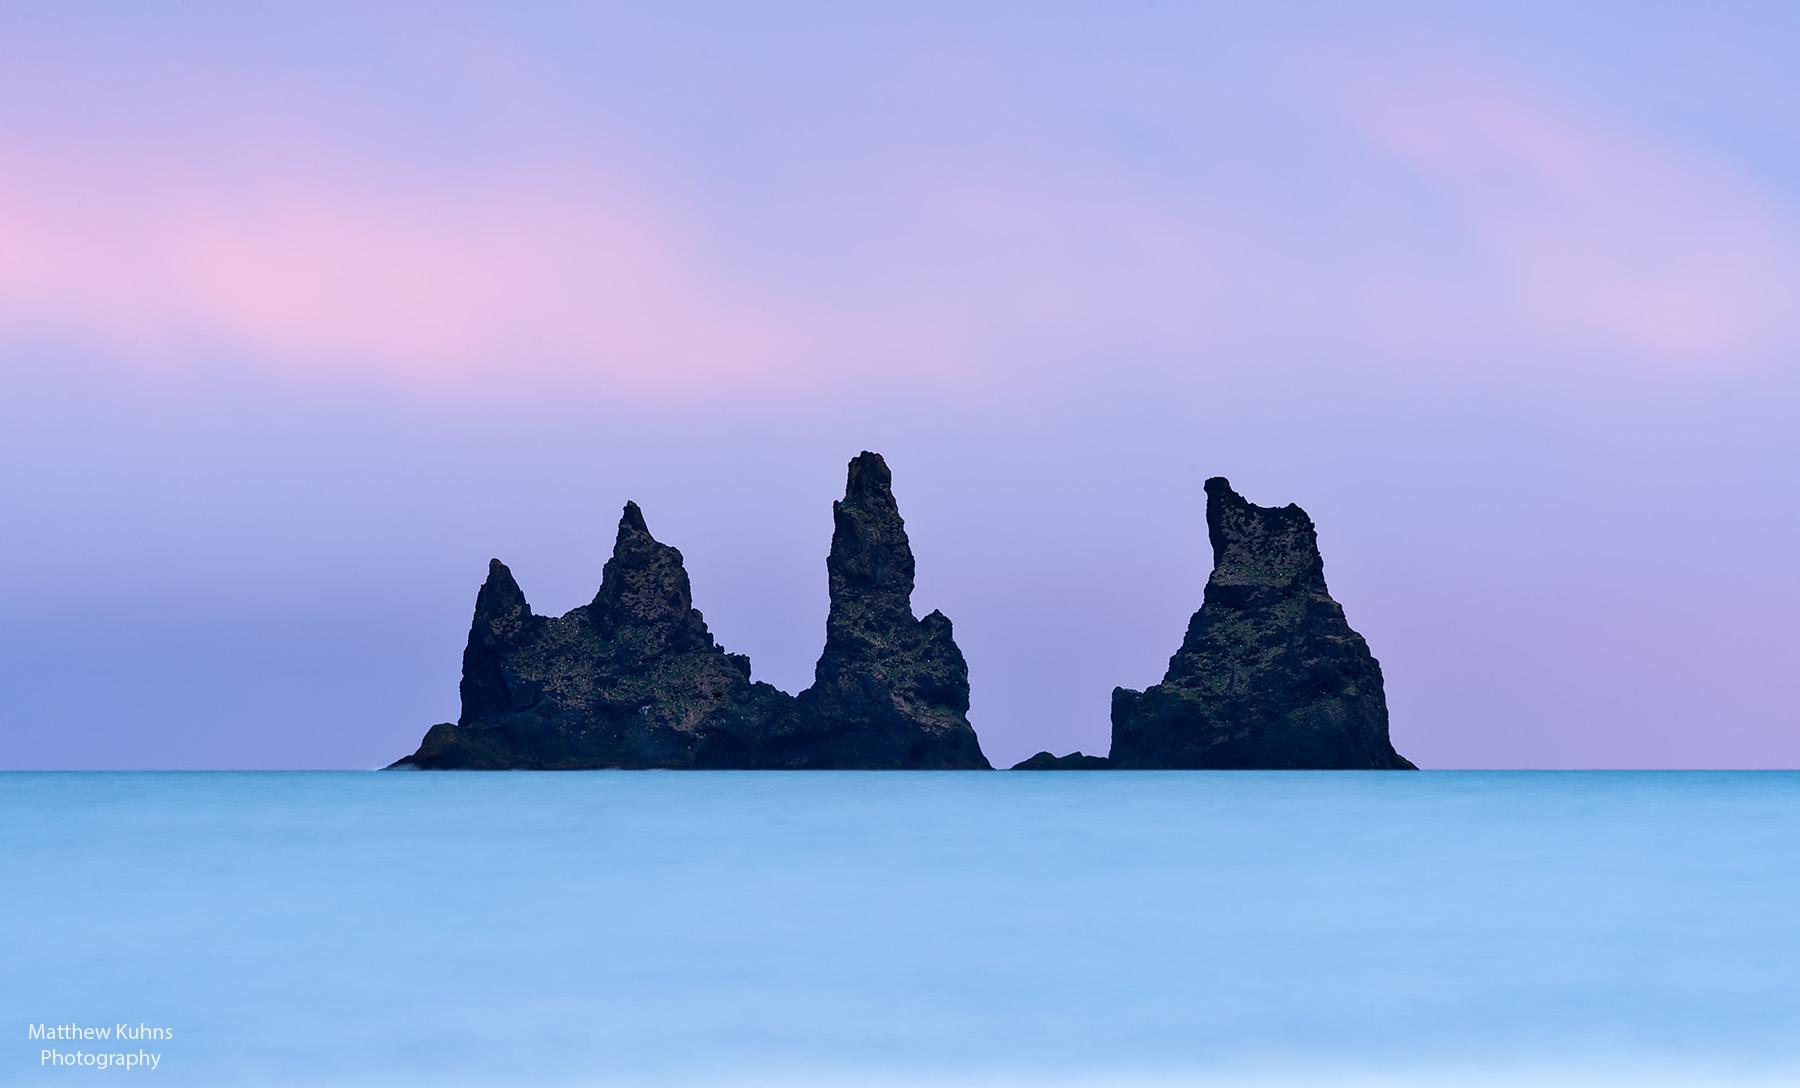 Click to Enlarge. The black sea stacks at Vik.